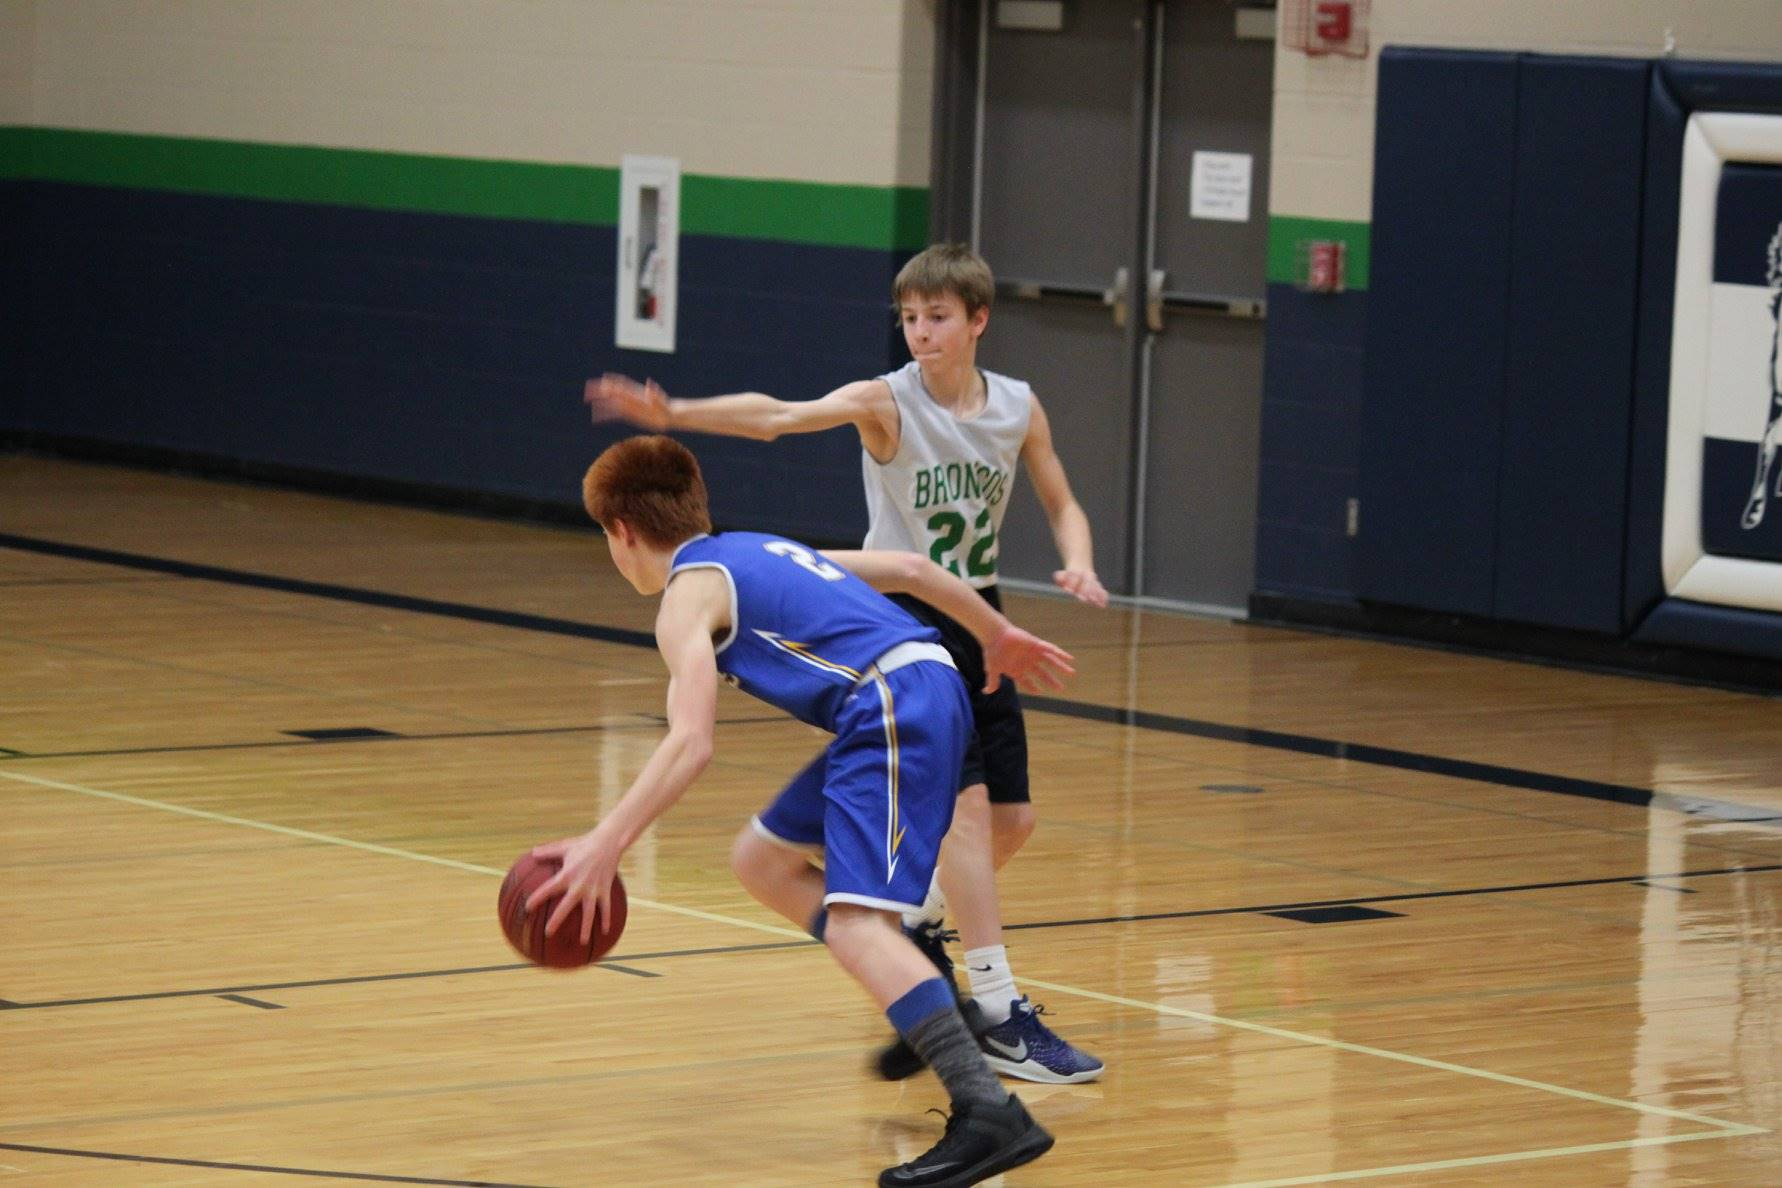 A boy dribbling a basketball